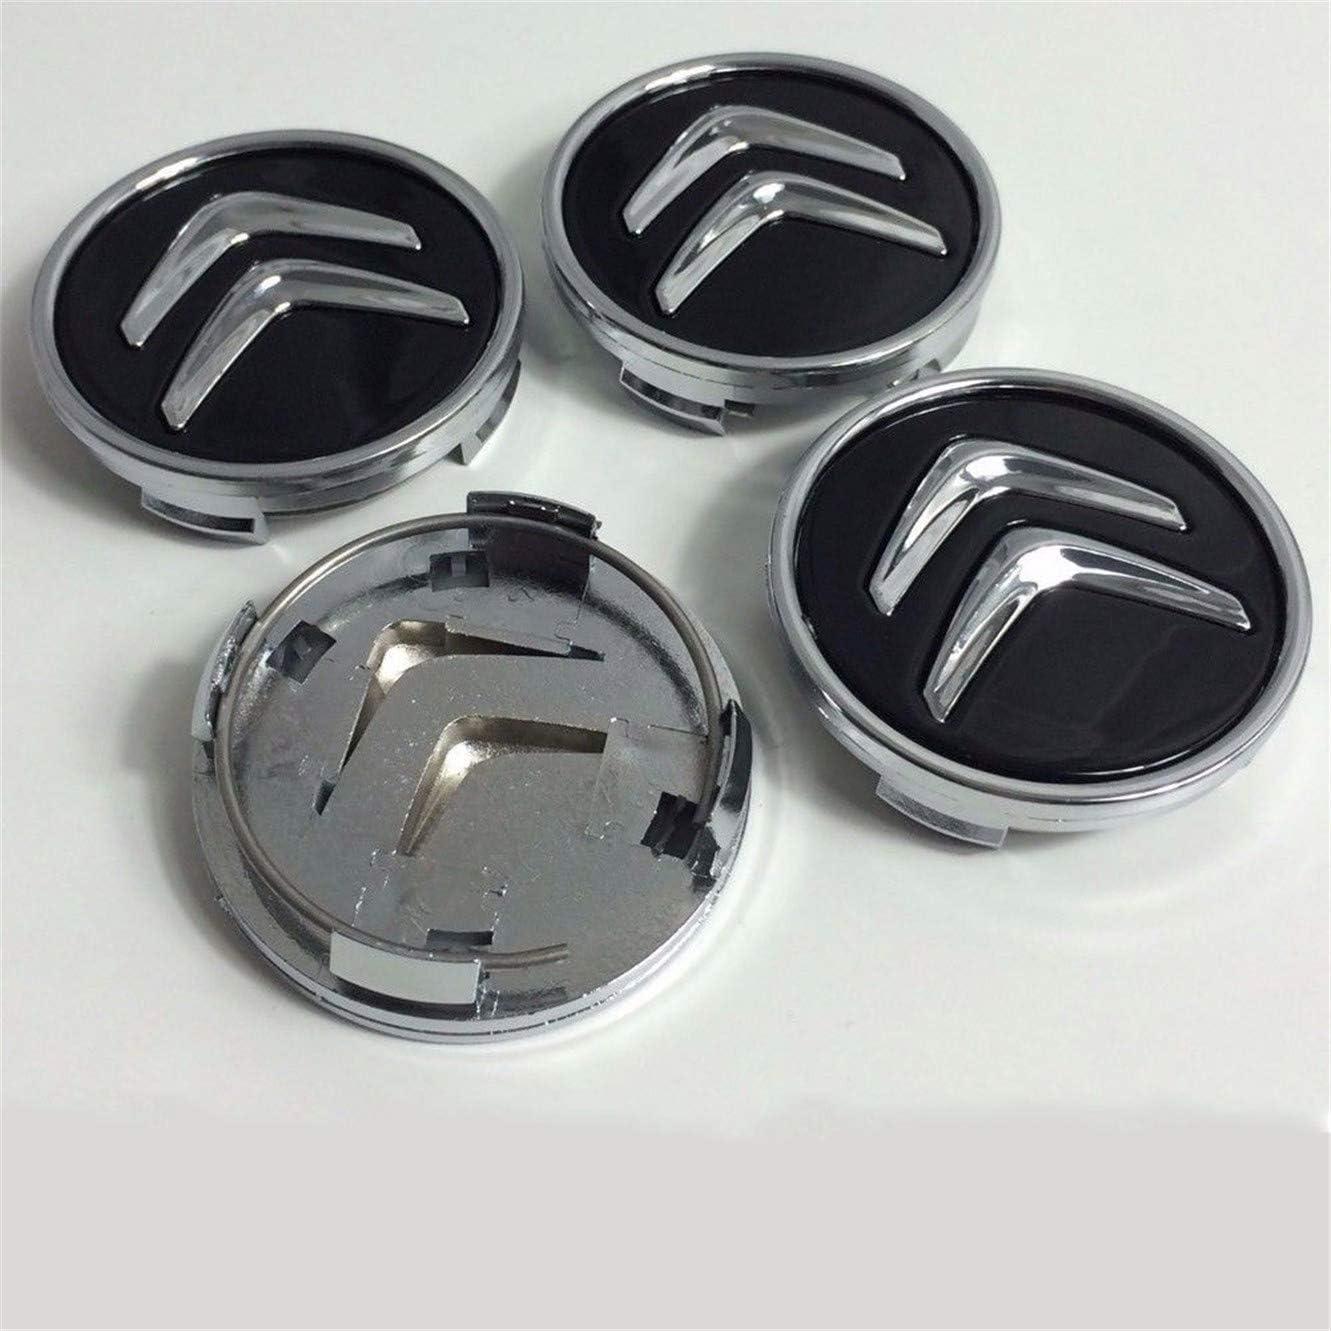 4PCS 60mm Wheel Center Hub Caps Cover Wheel Rim Logo Emblem for Citroen Black